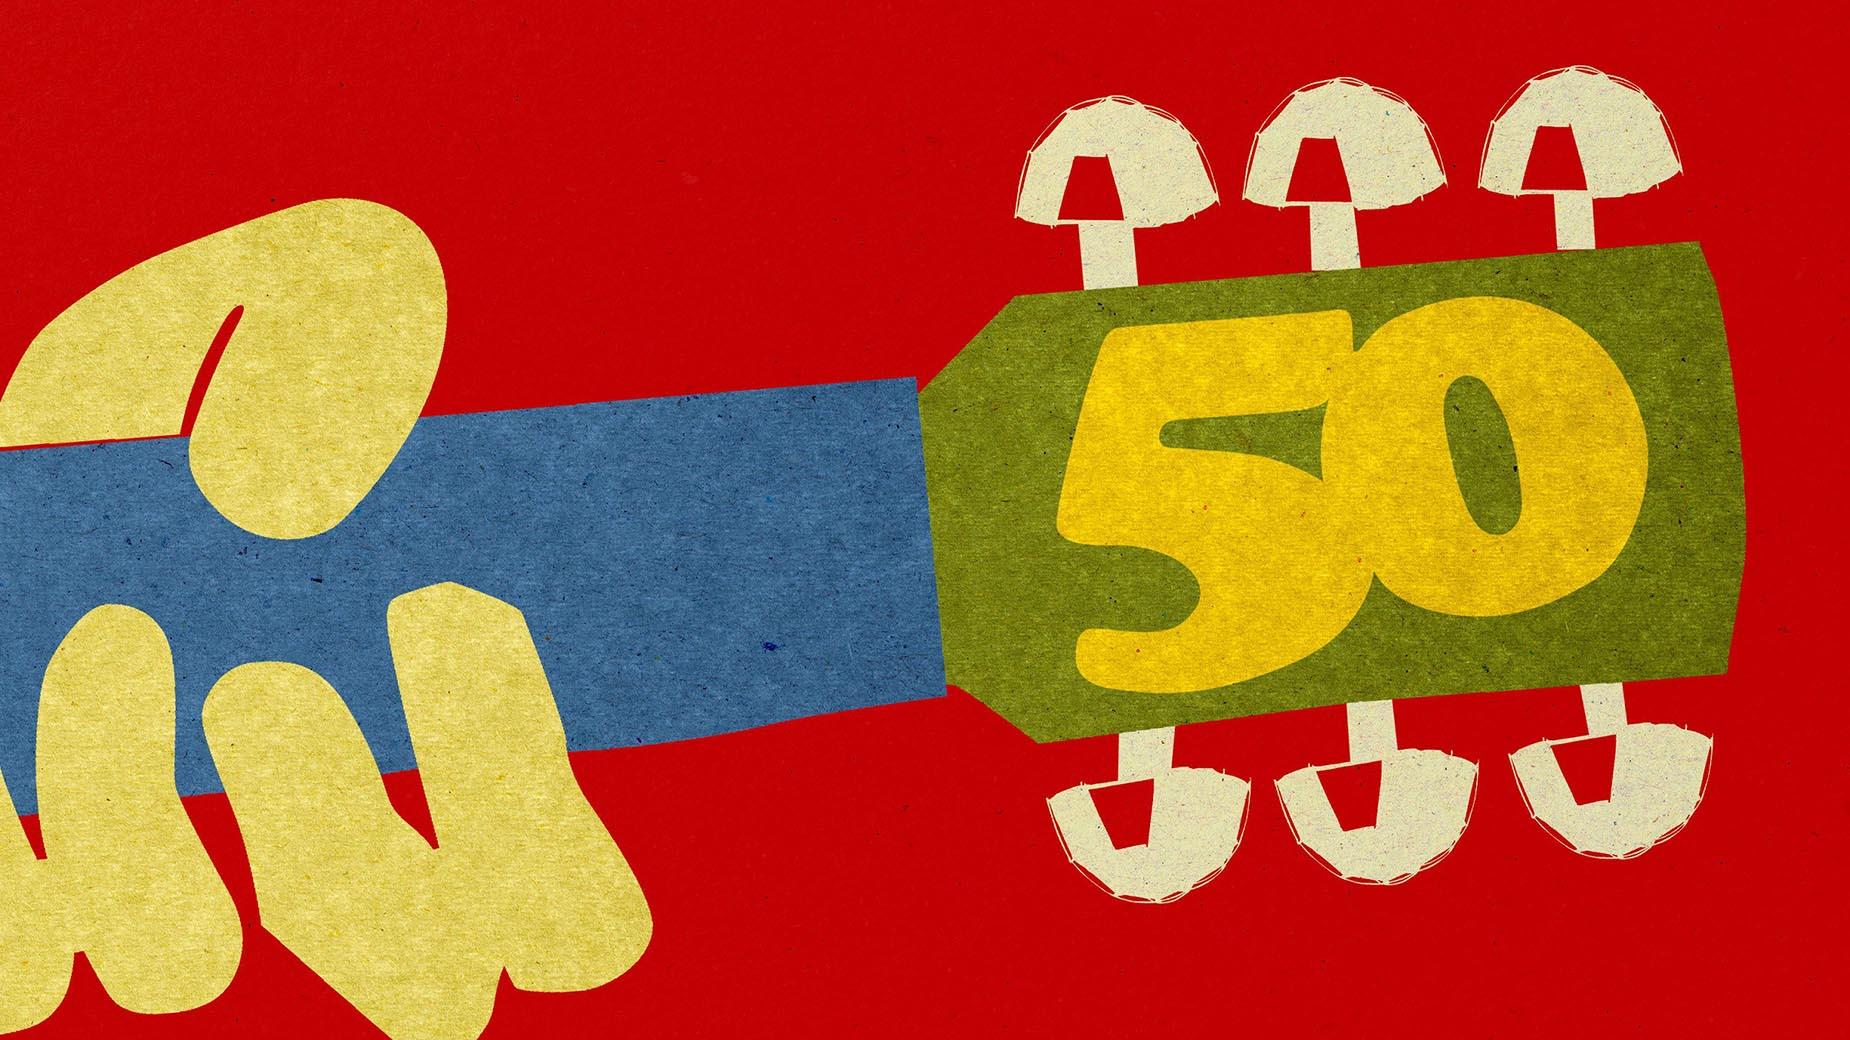 Cartel promocional del festival Woodstock 50.